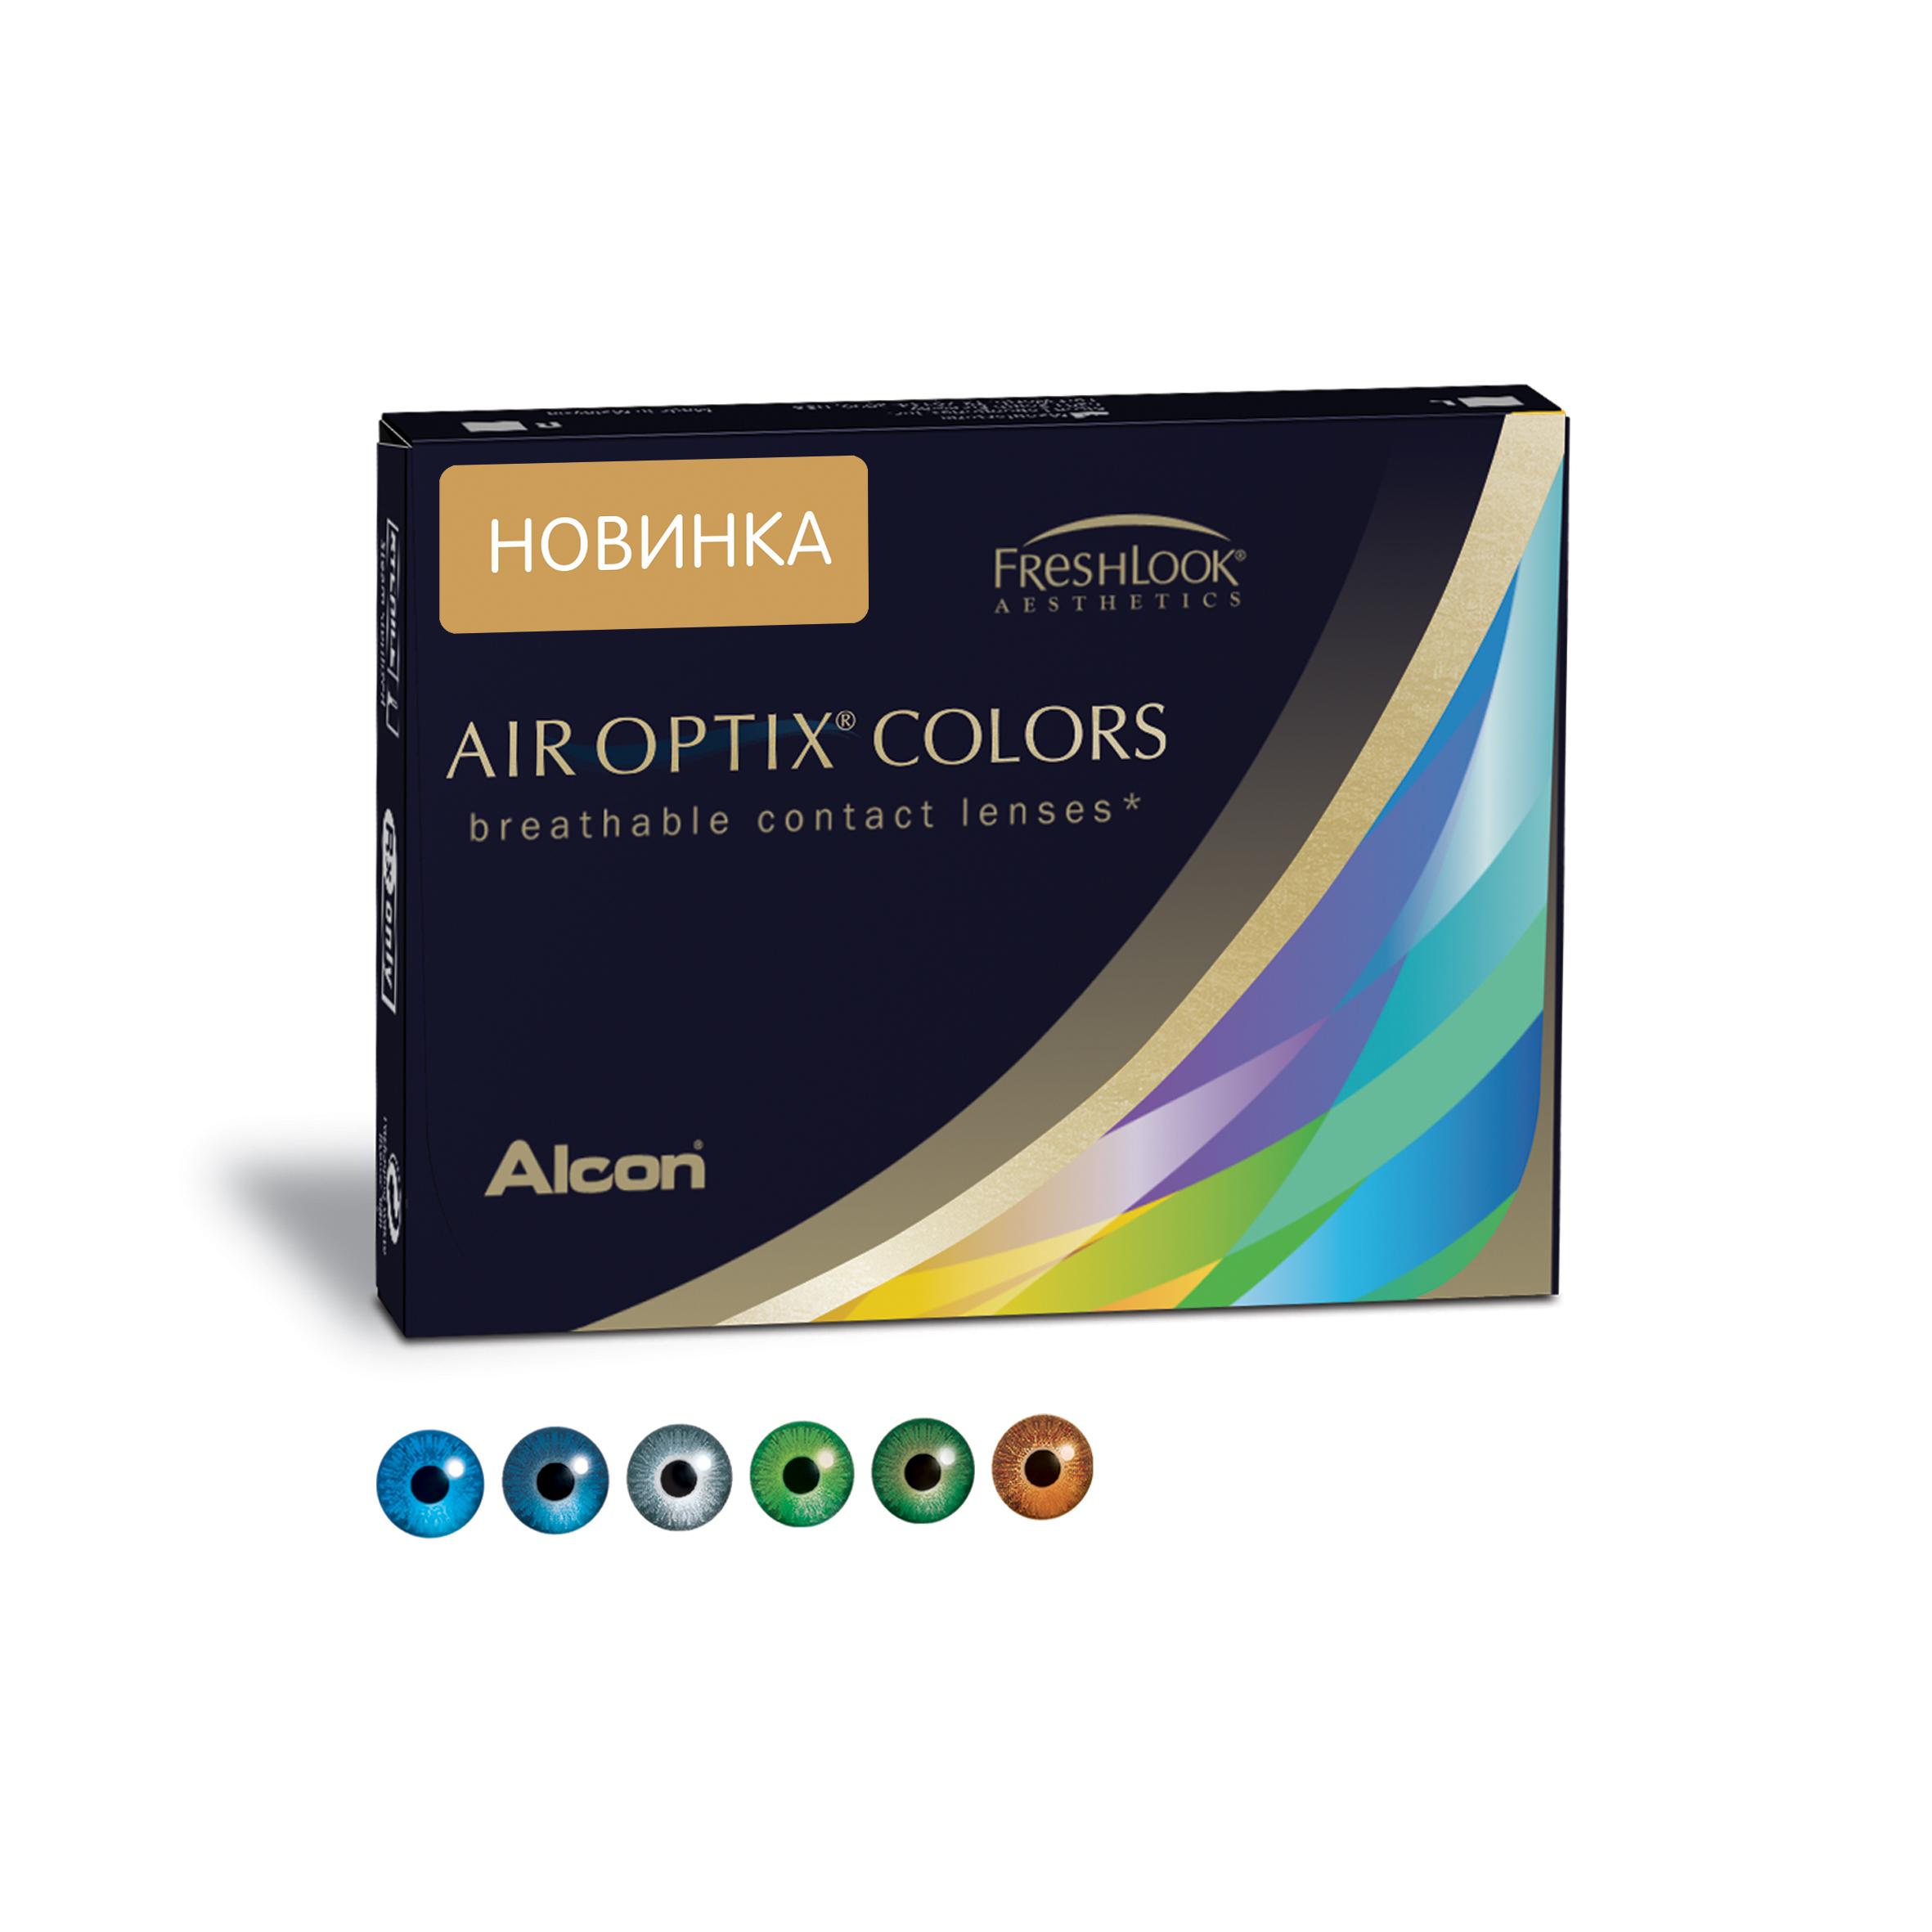 Аlcon контактные линзы Air Optix Colors 2 шт -2.25 Sterling Gray31746174Мягкие контактные линзы